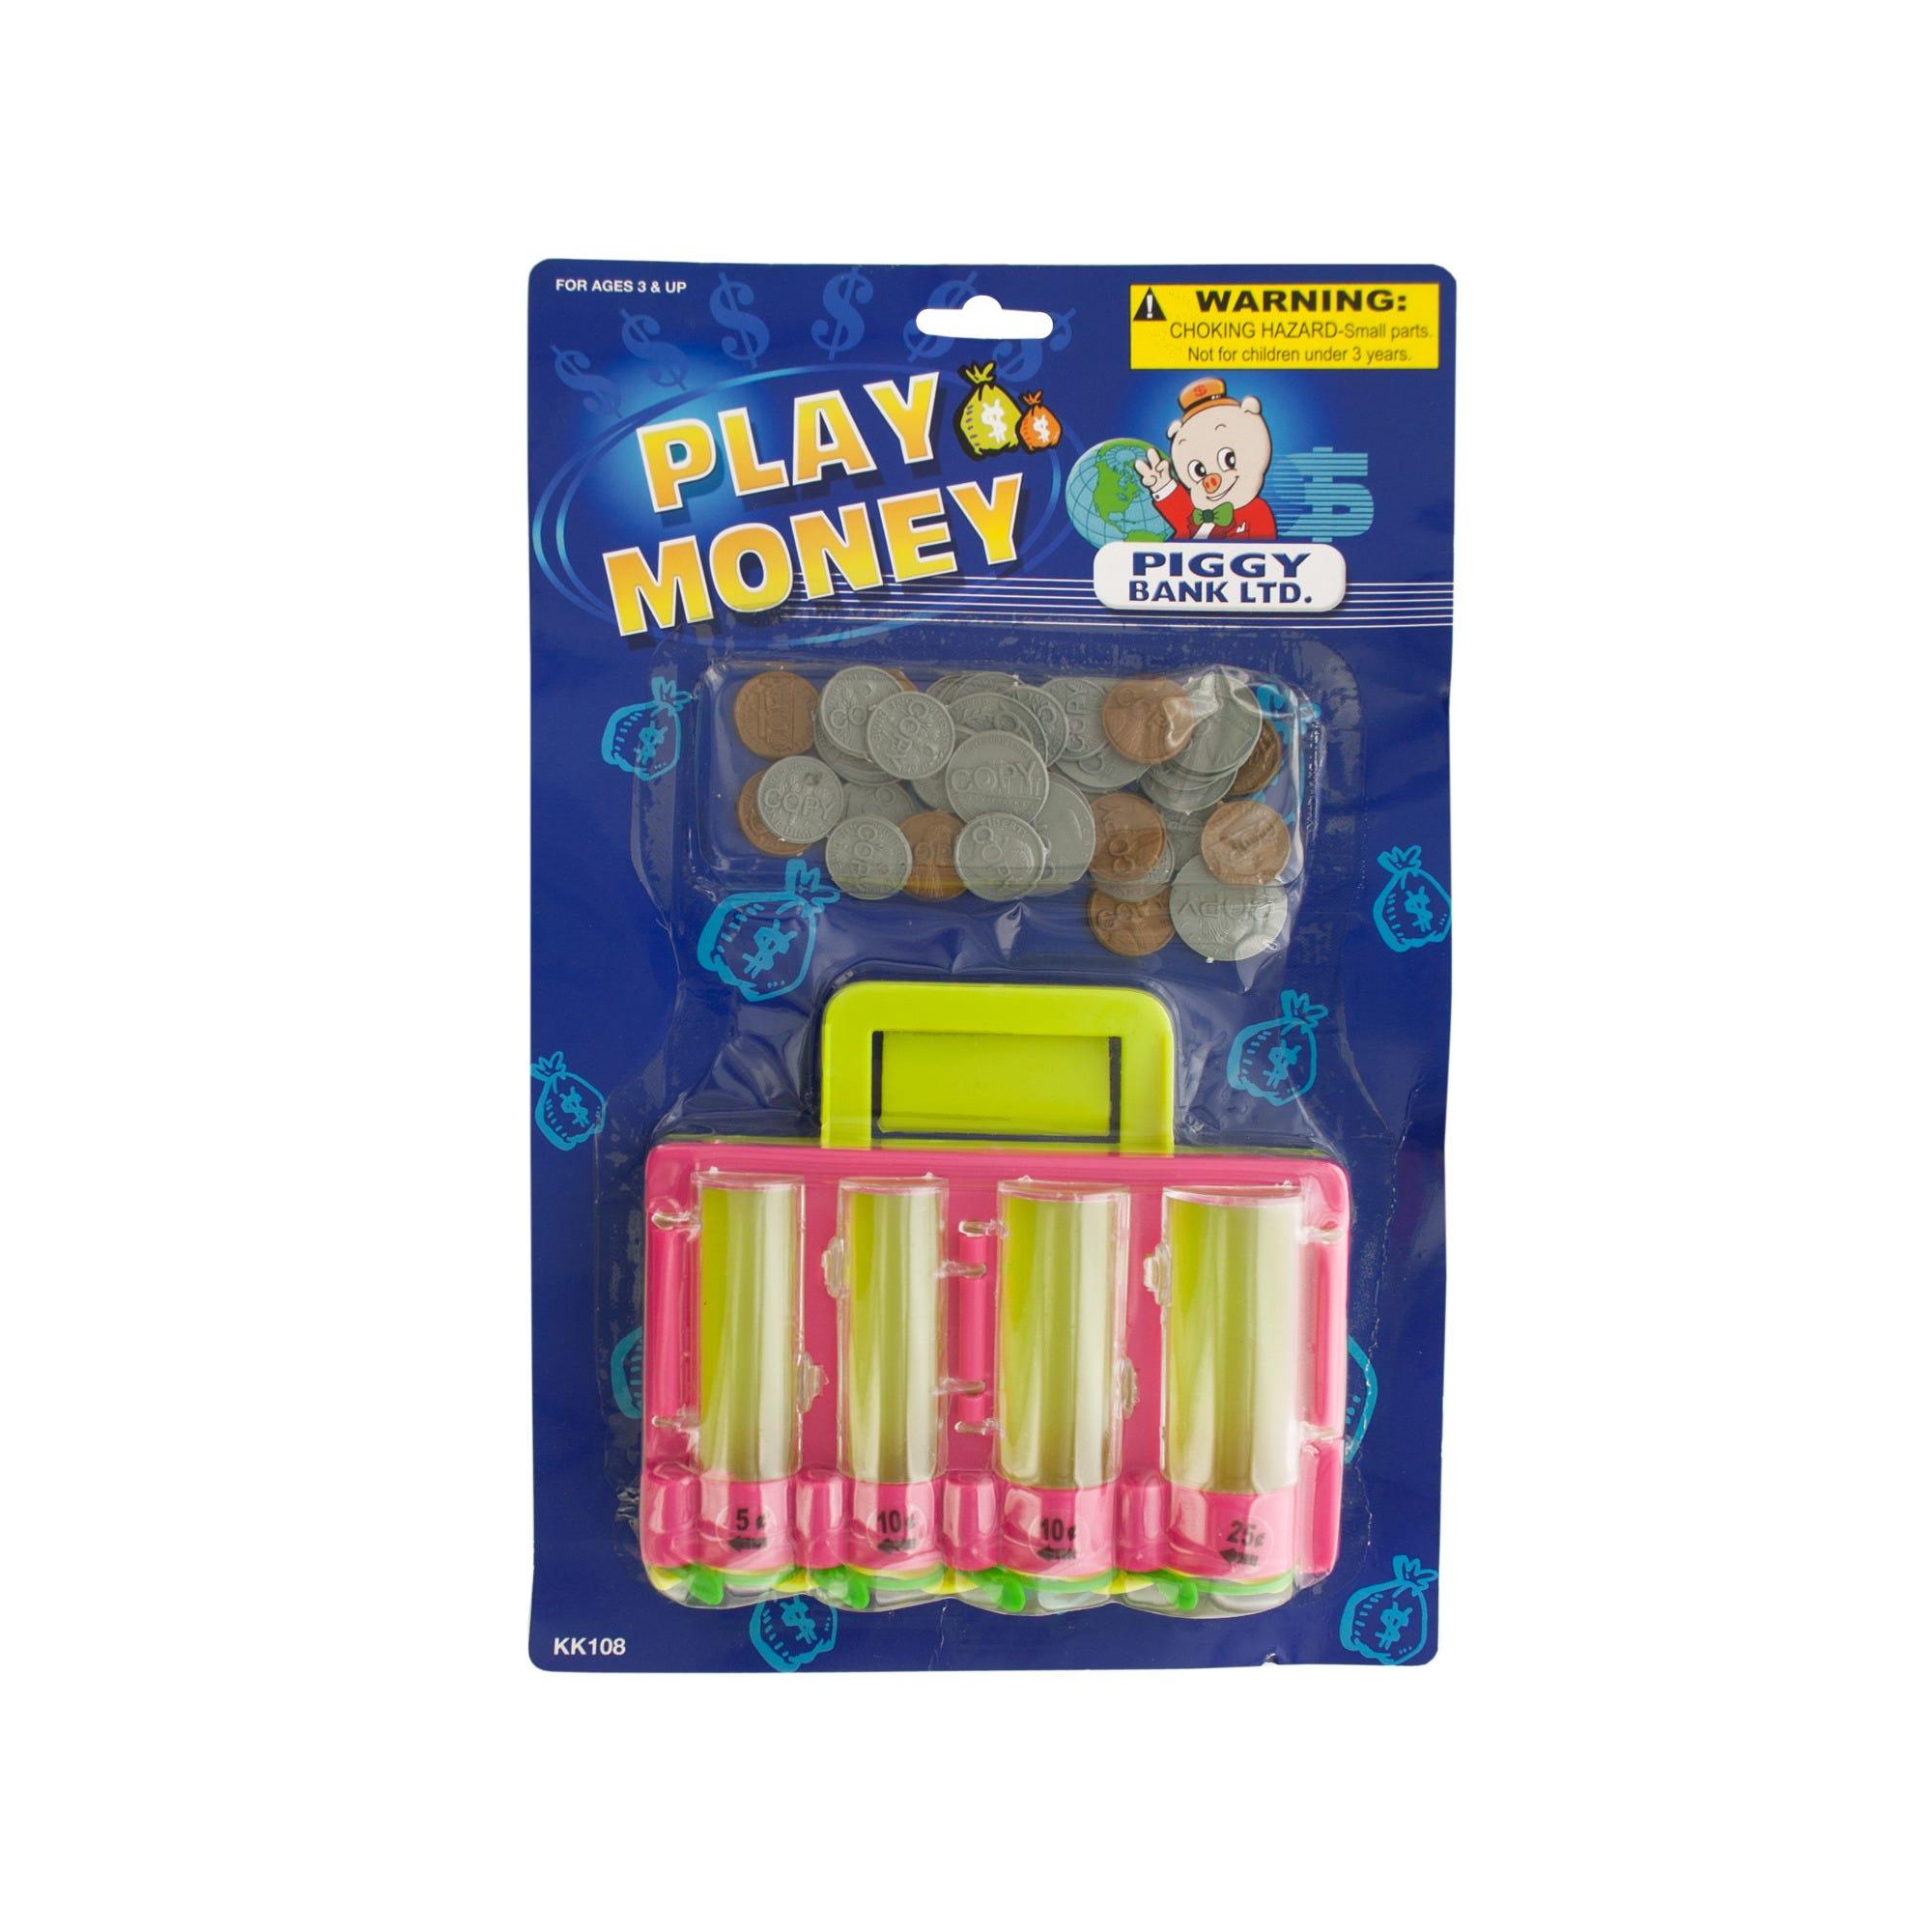 Play Money Toy Set- Qty 24